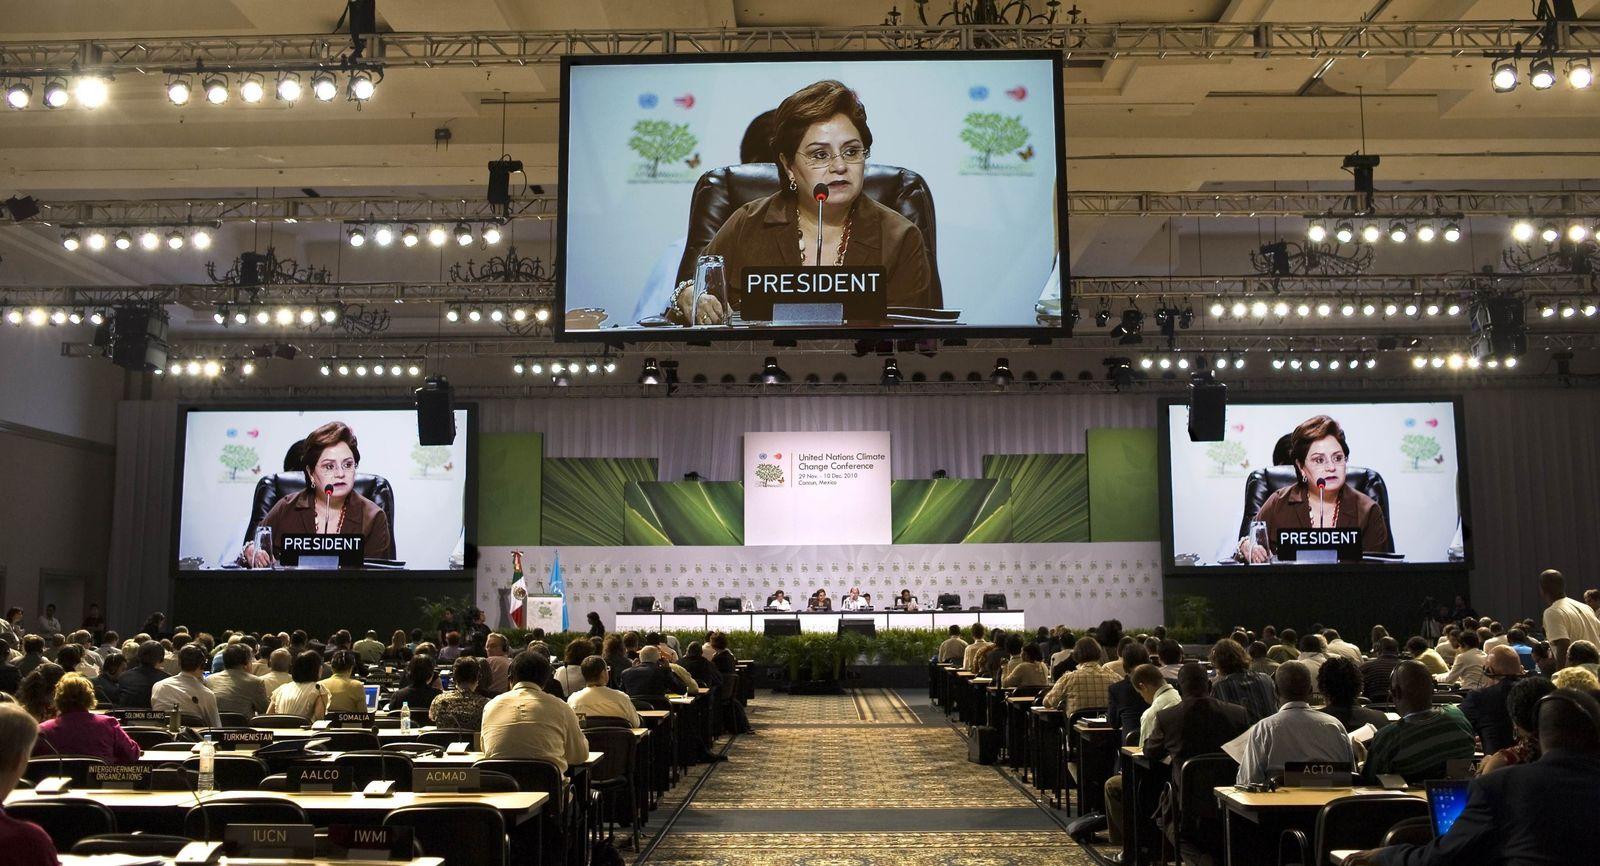 Cancun / Klimakonferenz / Klimawandel